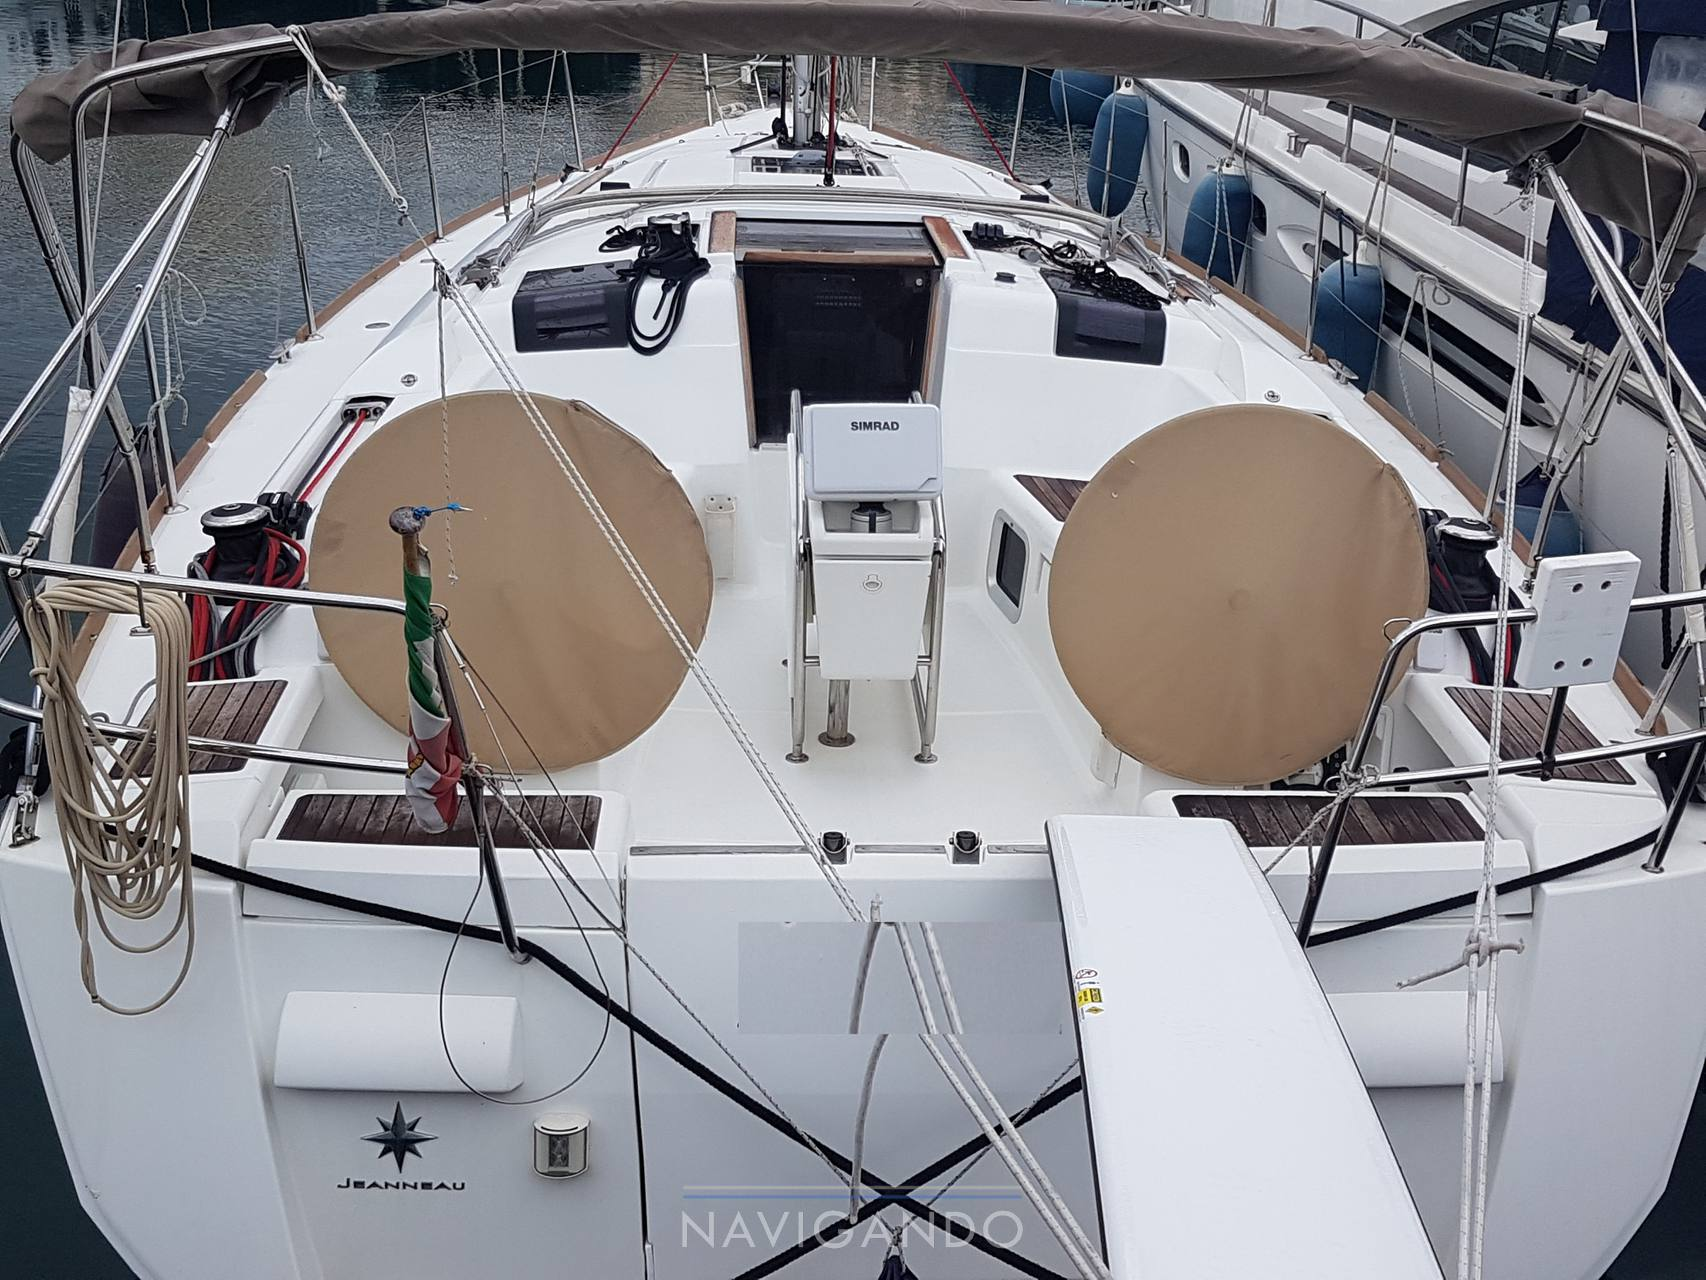 Jeanneau Sun odyssey 409 Barca a vela usata in vendita